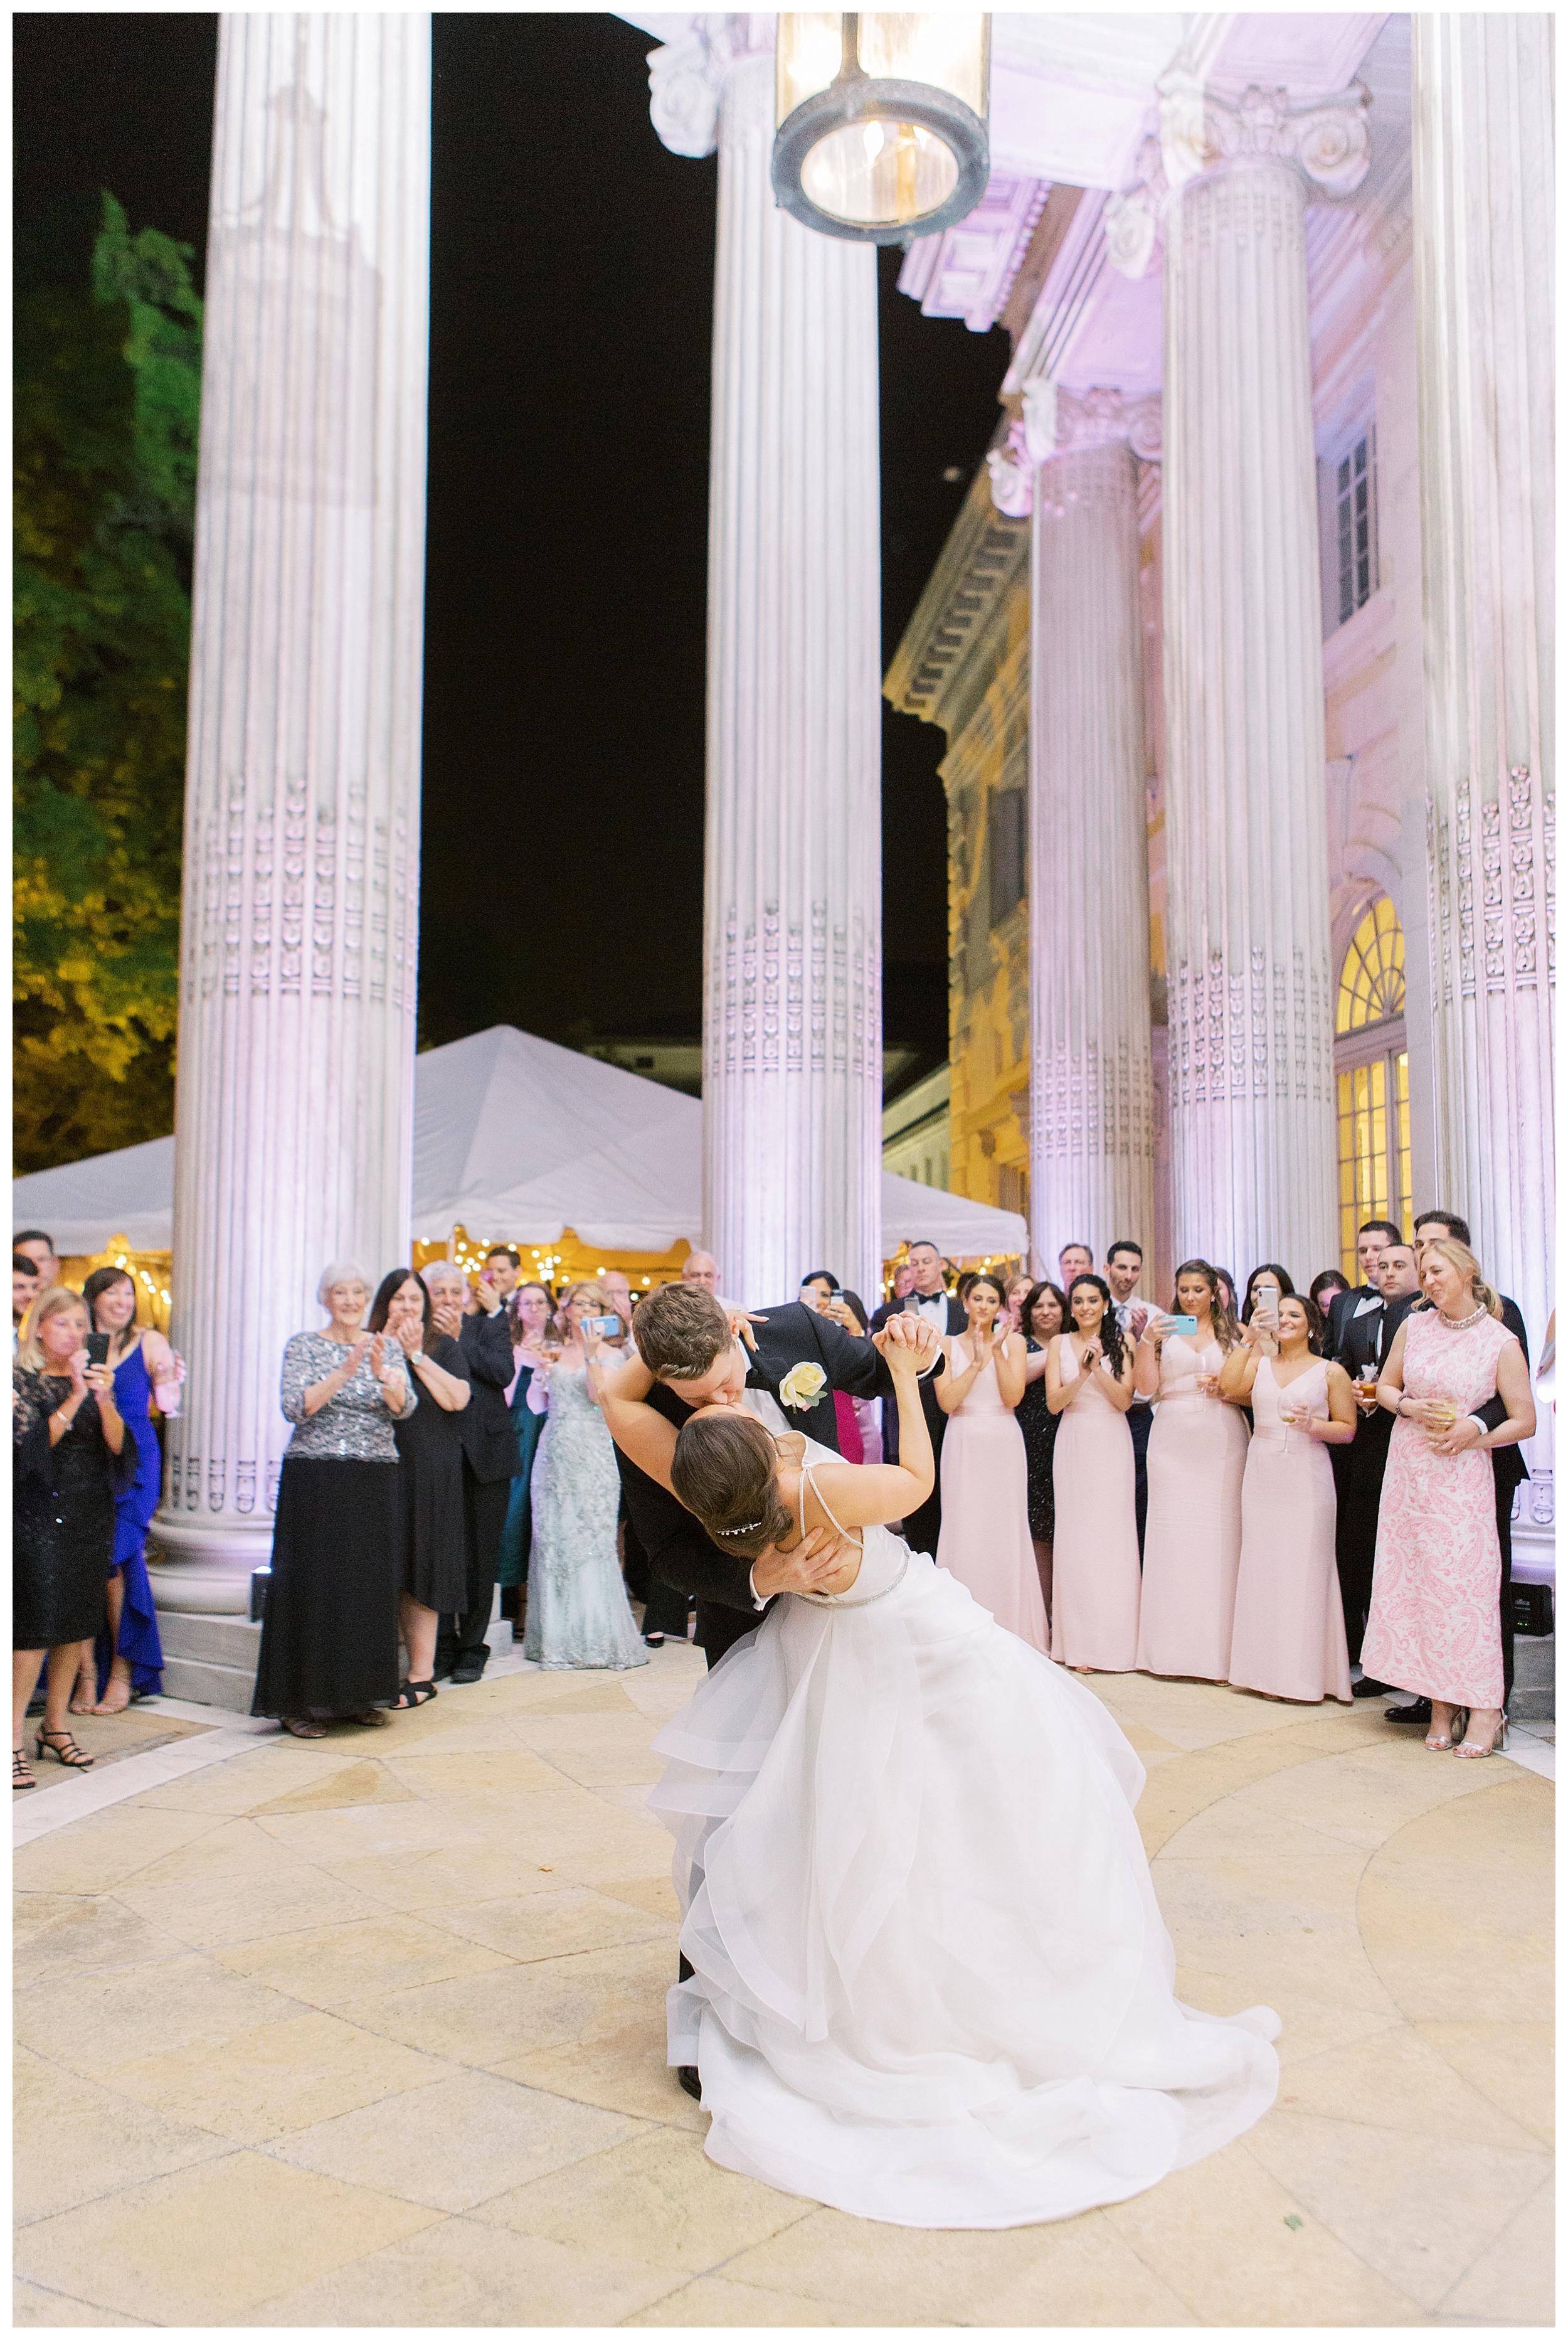 DAR Constitution Hall Wedding Wedding | Daughters of the American Revolution Wedding | District of Columbia Film Wedding Photographer Kir Tuben_0136.jpg